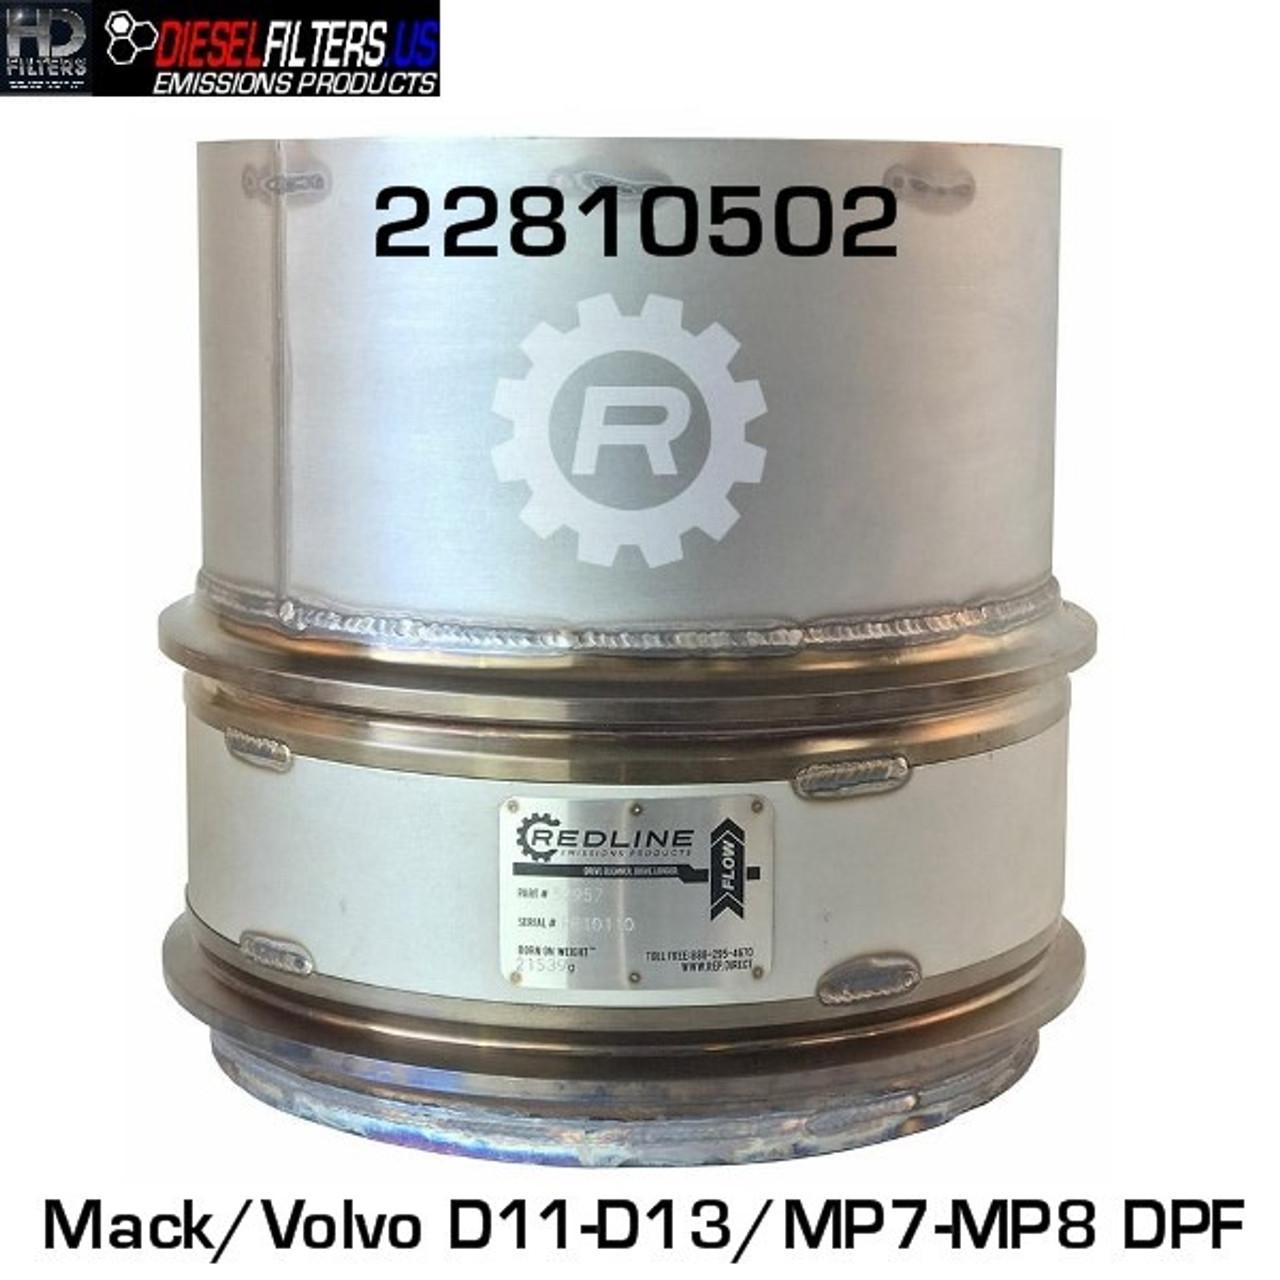 22810502 Mack/Volvo D11/D13/MP7/MP8 DPF (RED 52957)